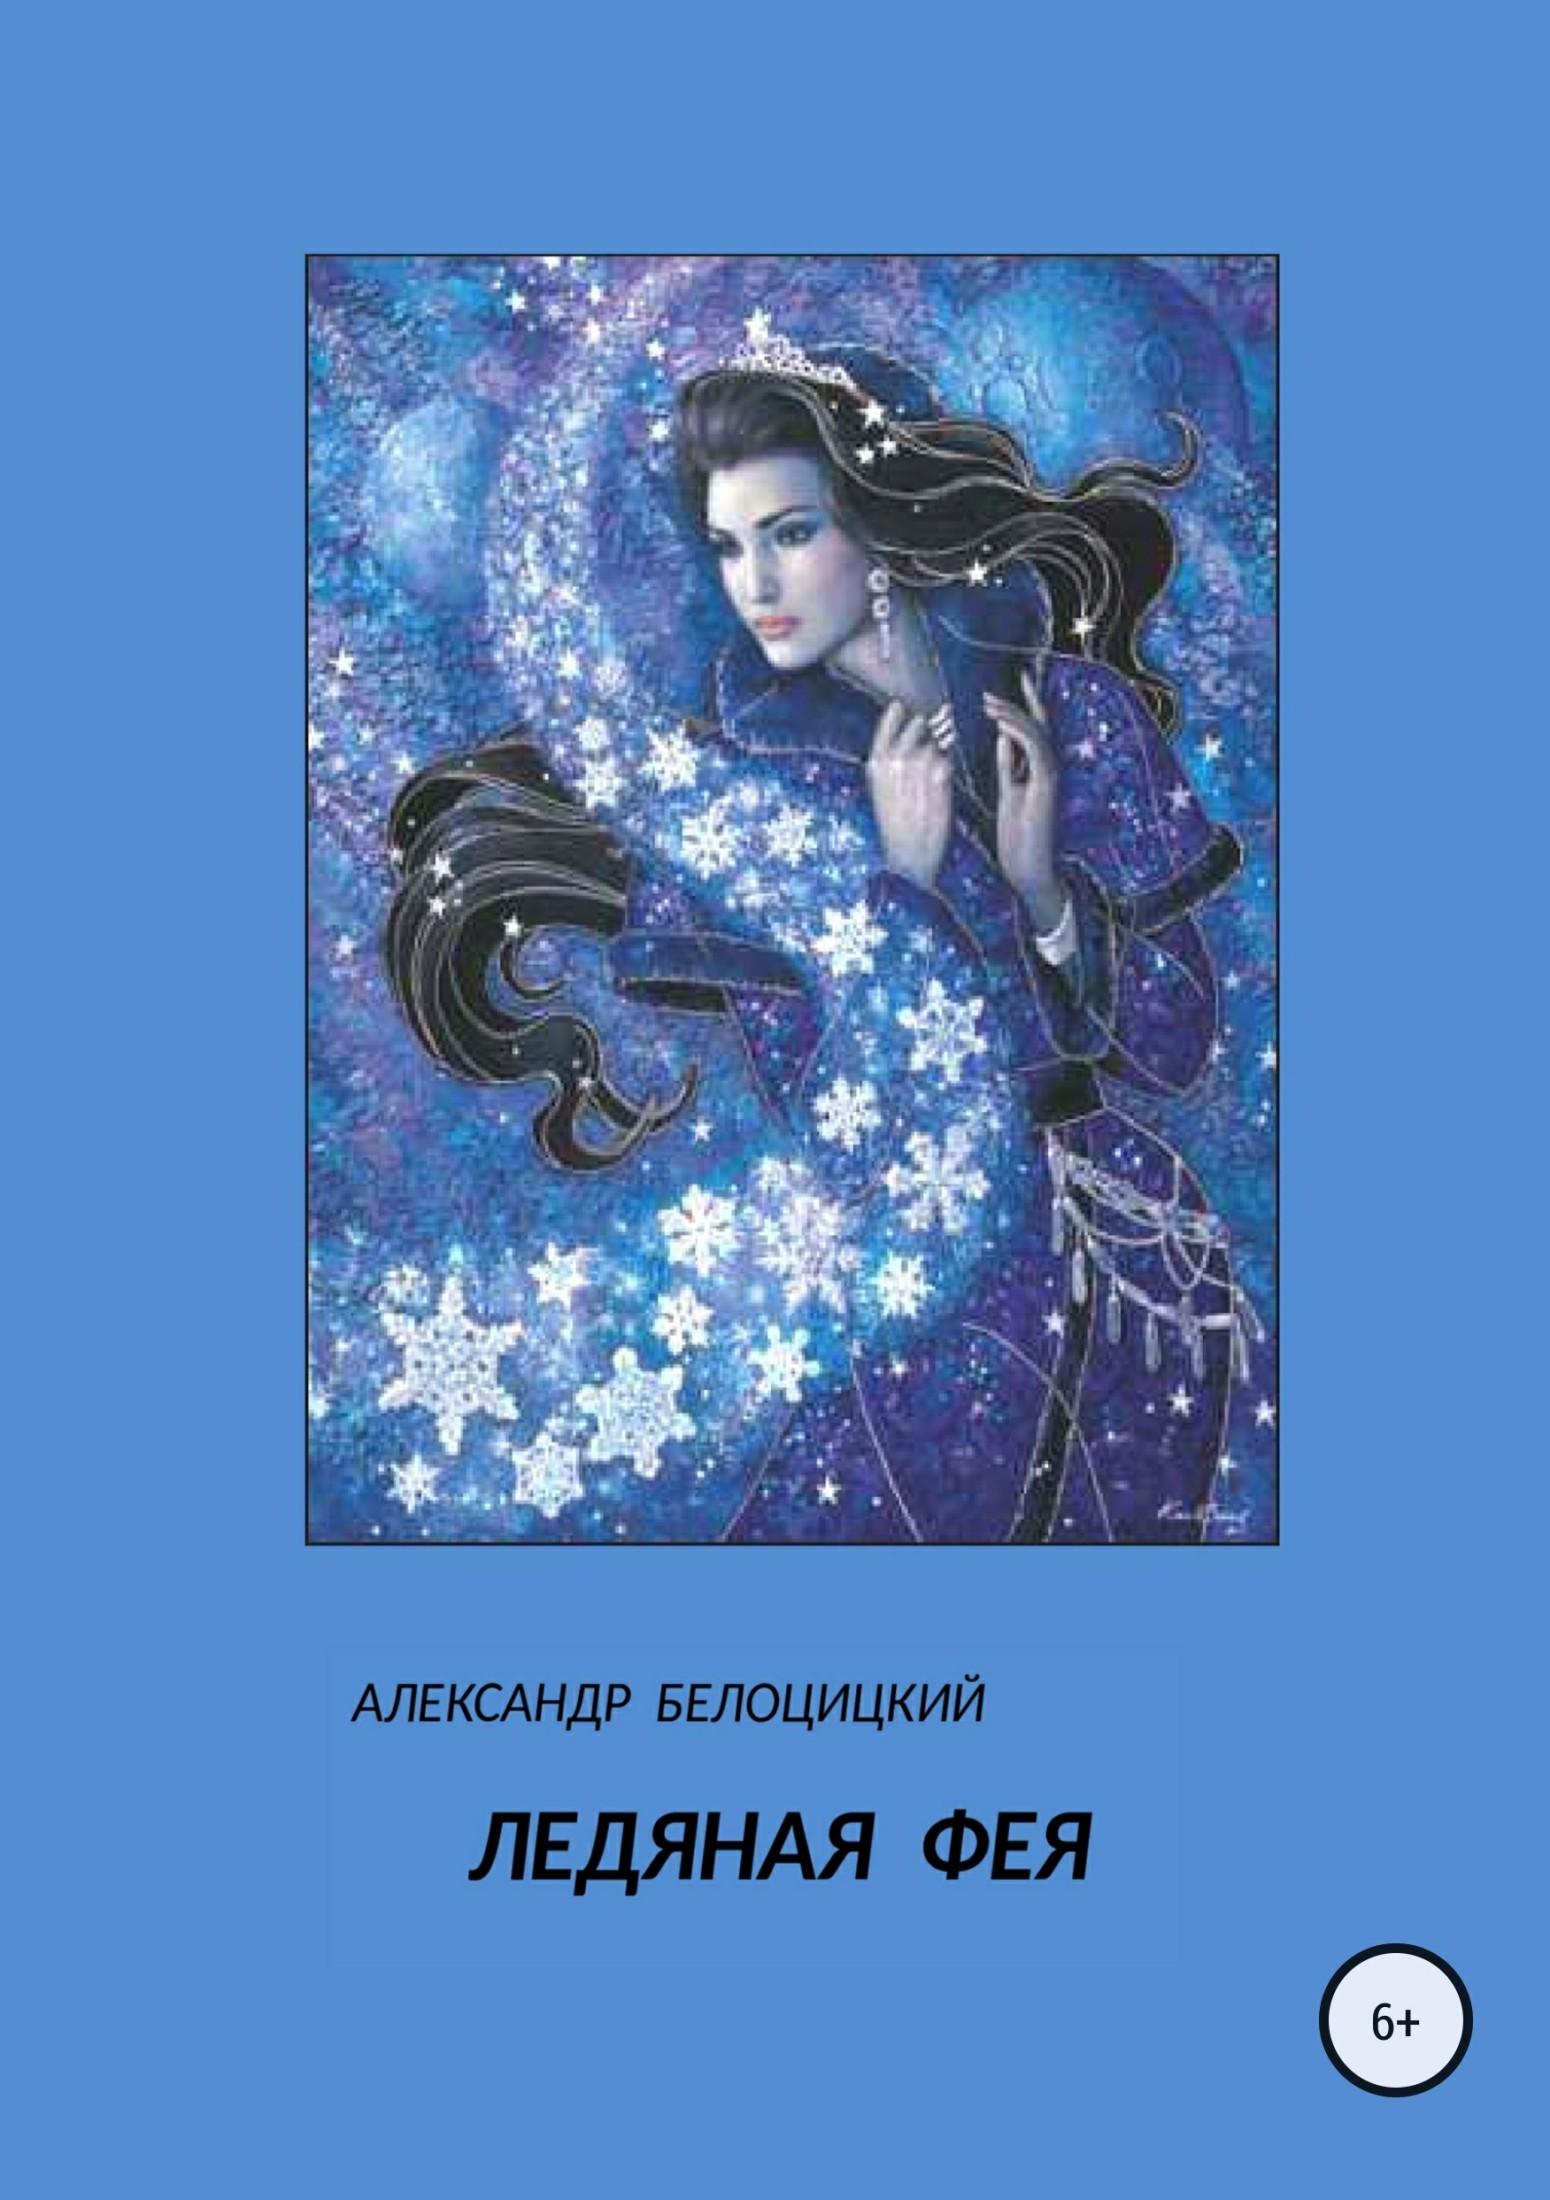 Александр Николаевич Белоцицкий бесплатно